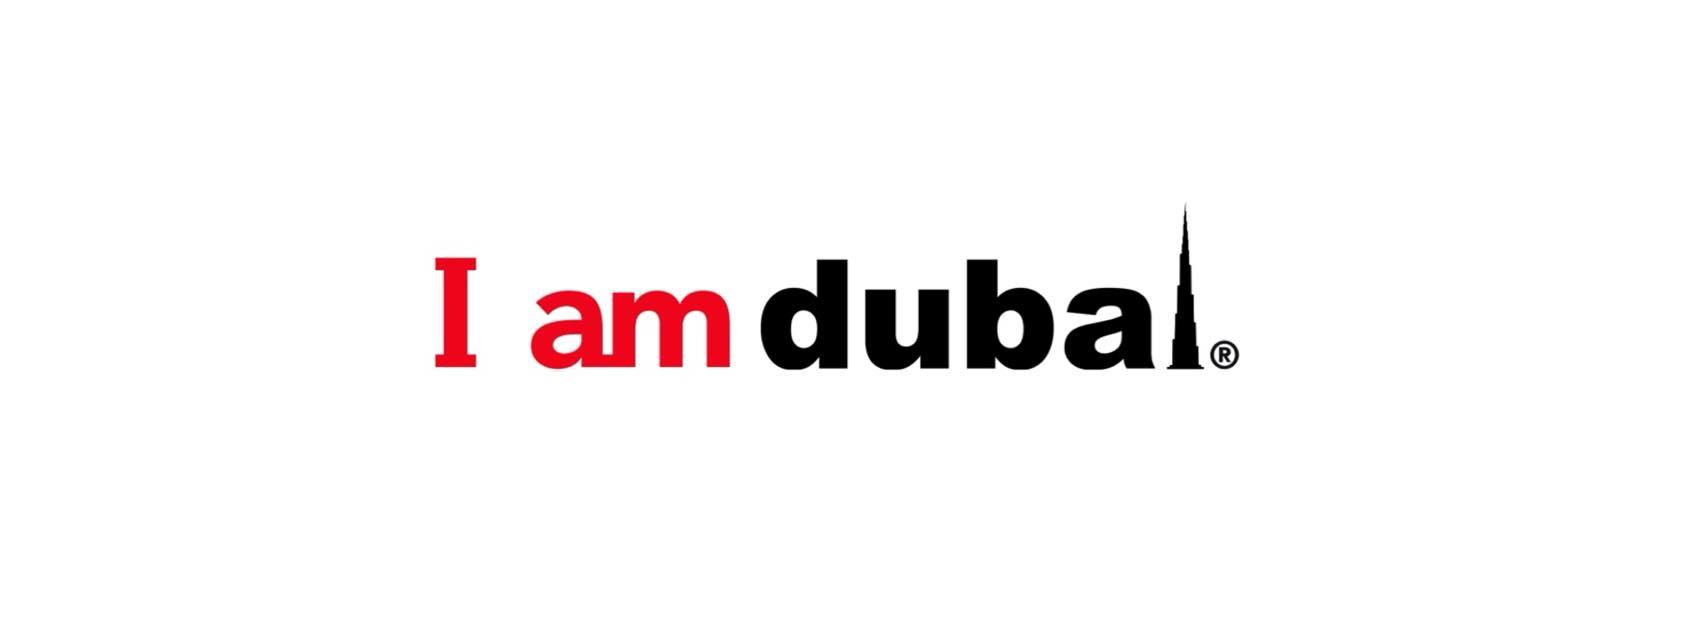 \'I am dubai\' App Available Now to Use